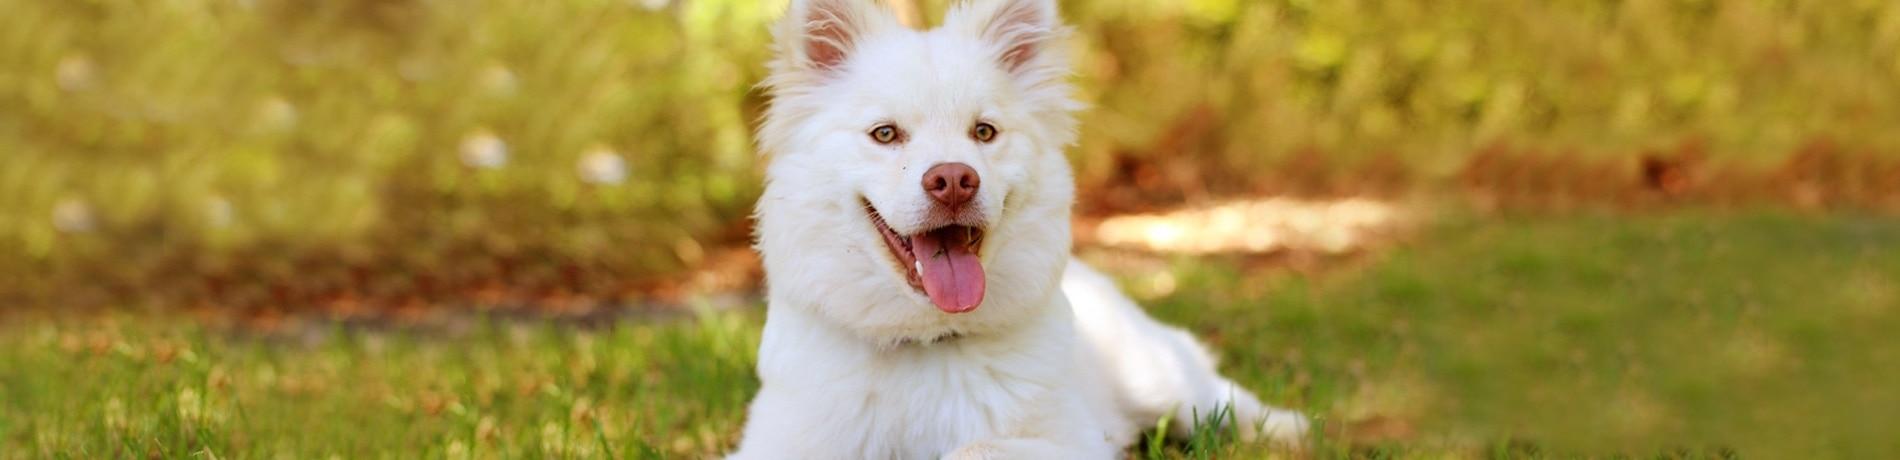 6 mythes over hondenverzekering